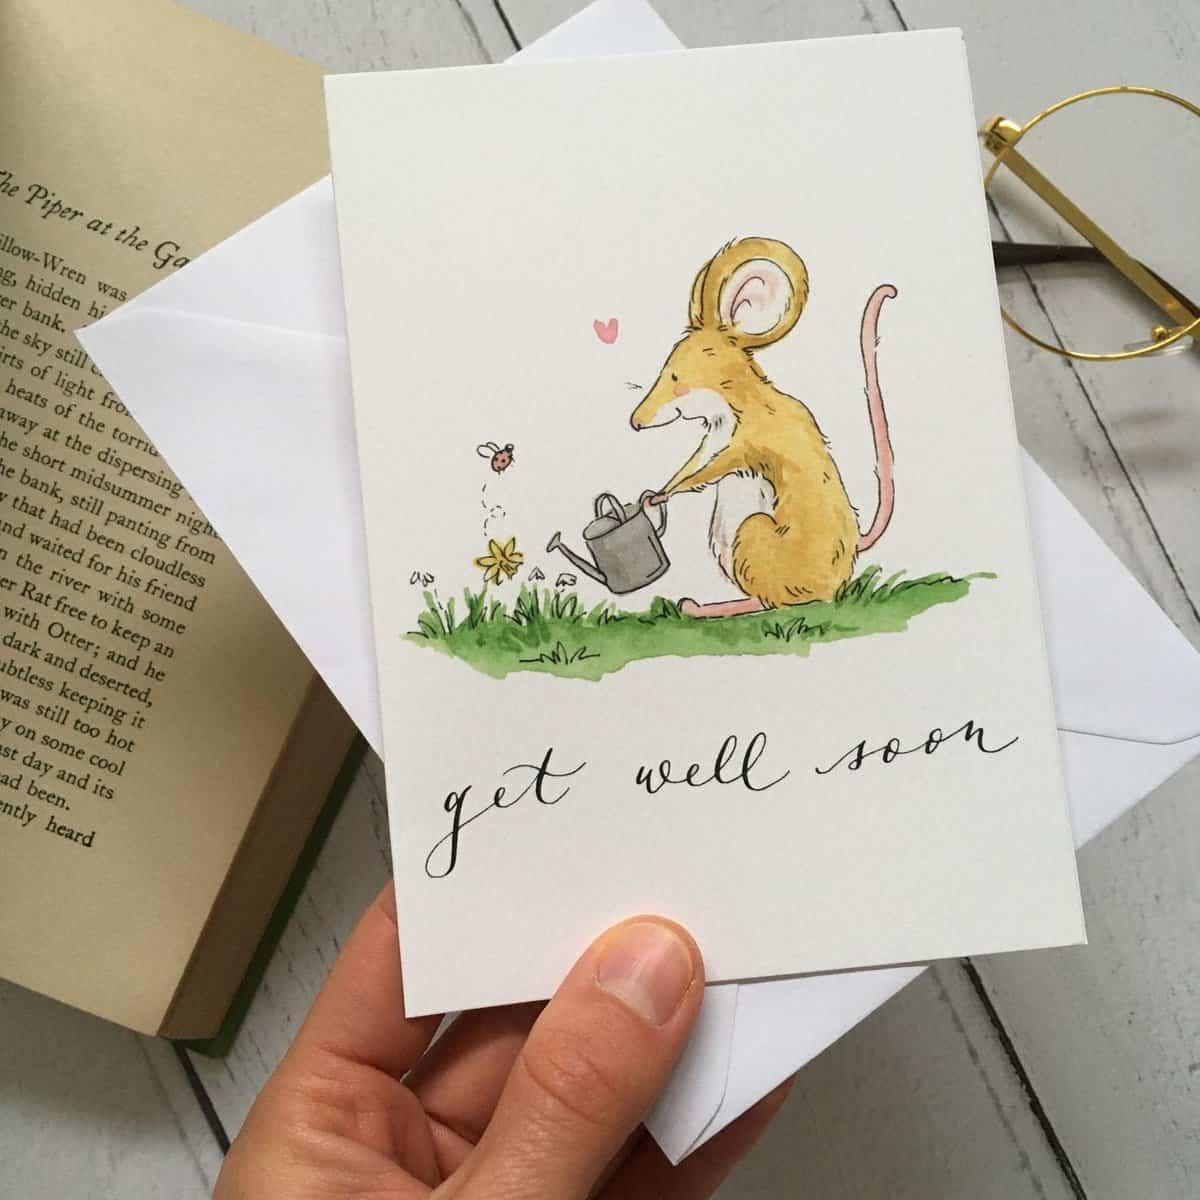 Get well by ellie hooi illustration